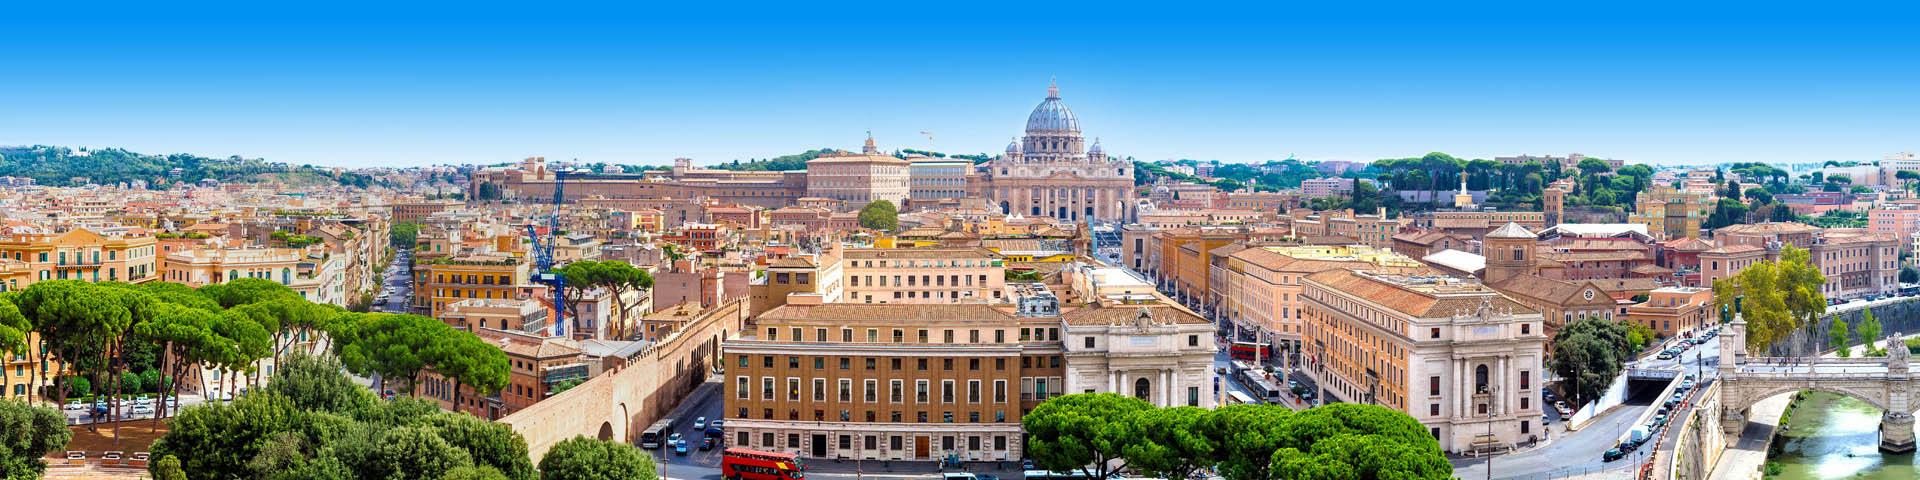 Stedentrip uitzicht op de Sint Pieter in Rome